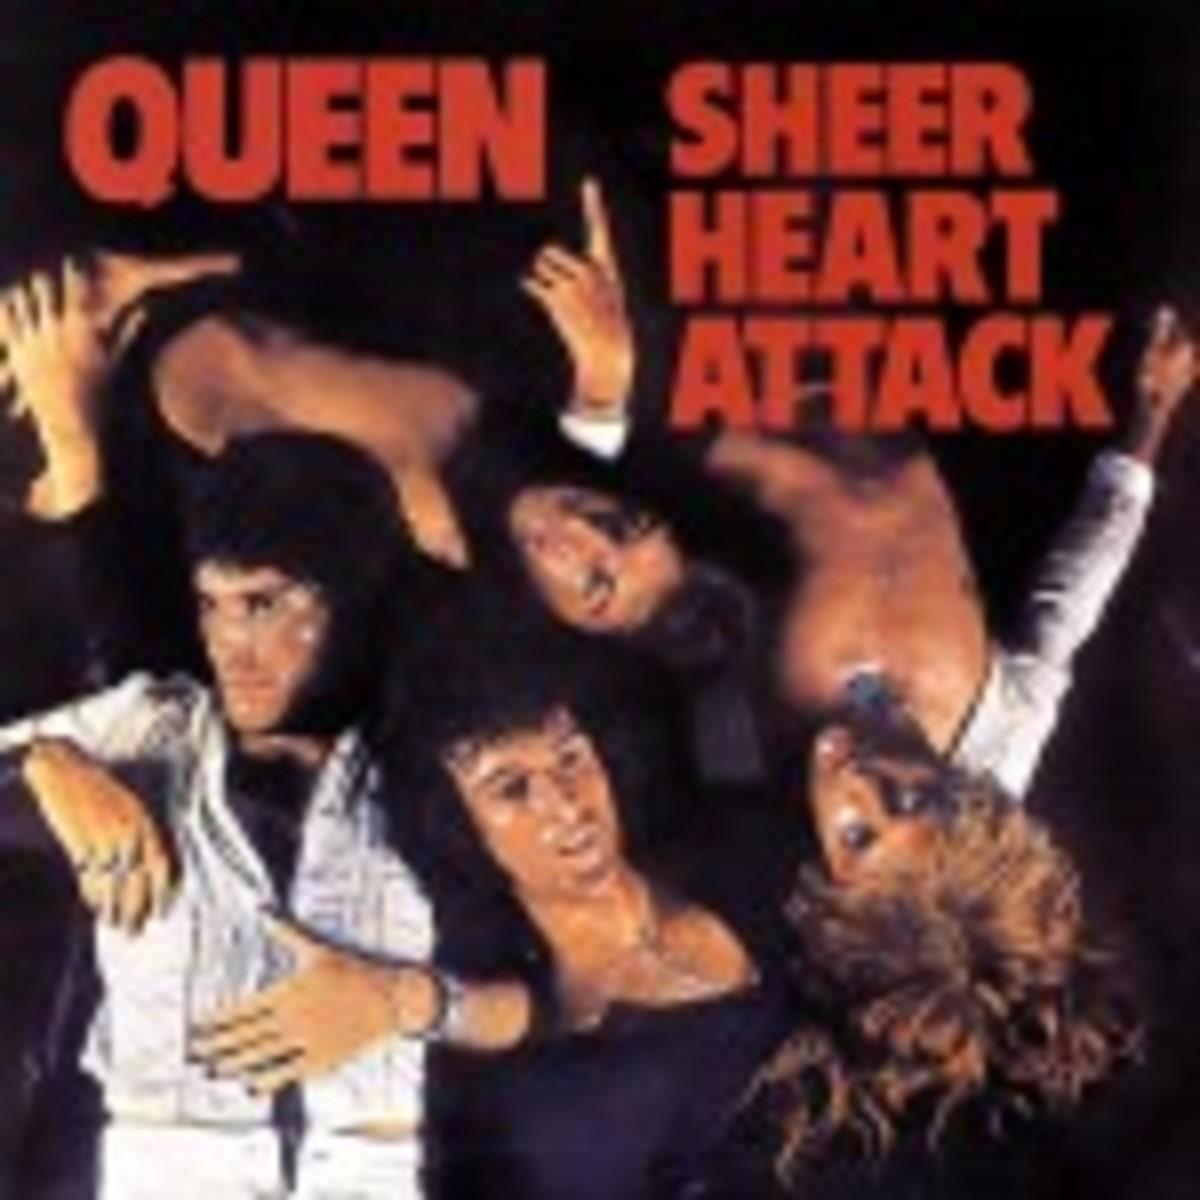 Queen_SheerHeartAttack